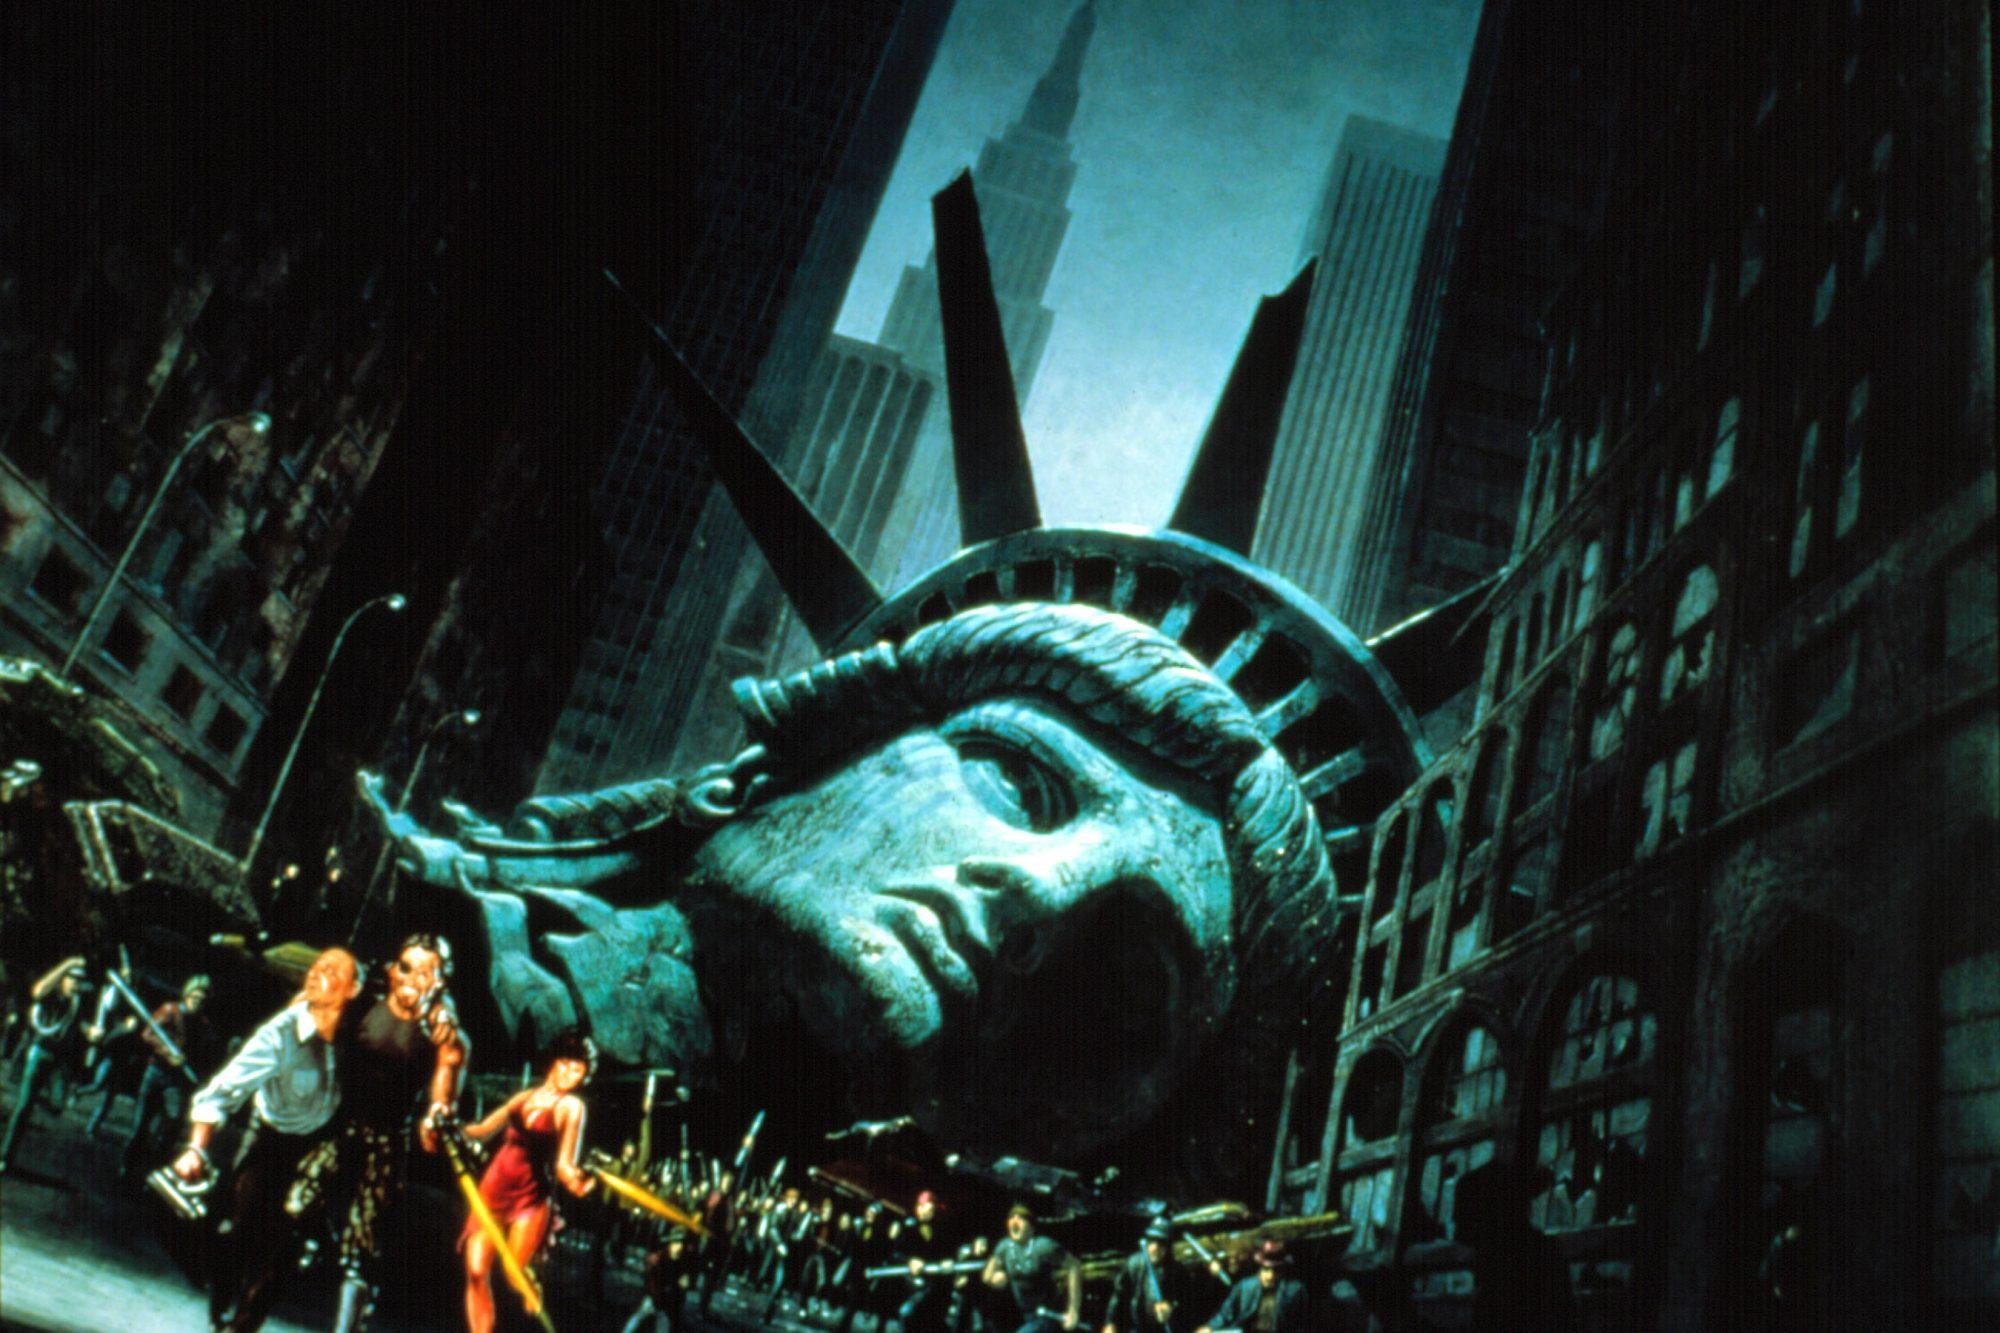 ESCAPE FROM NEW YORK, Kurt Russell, 1981